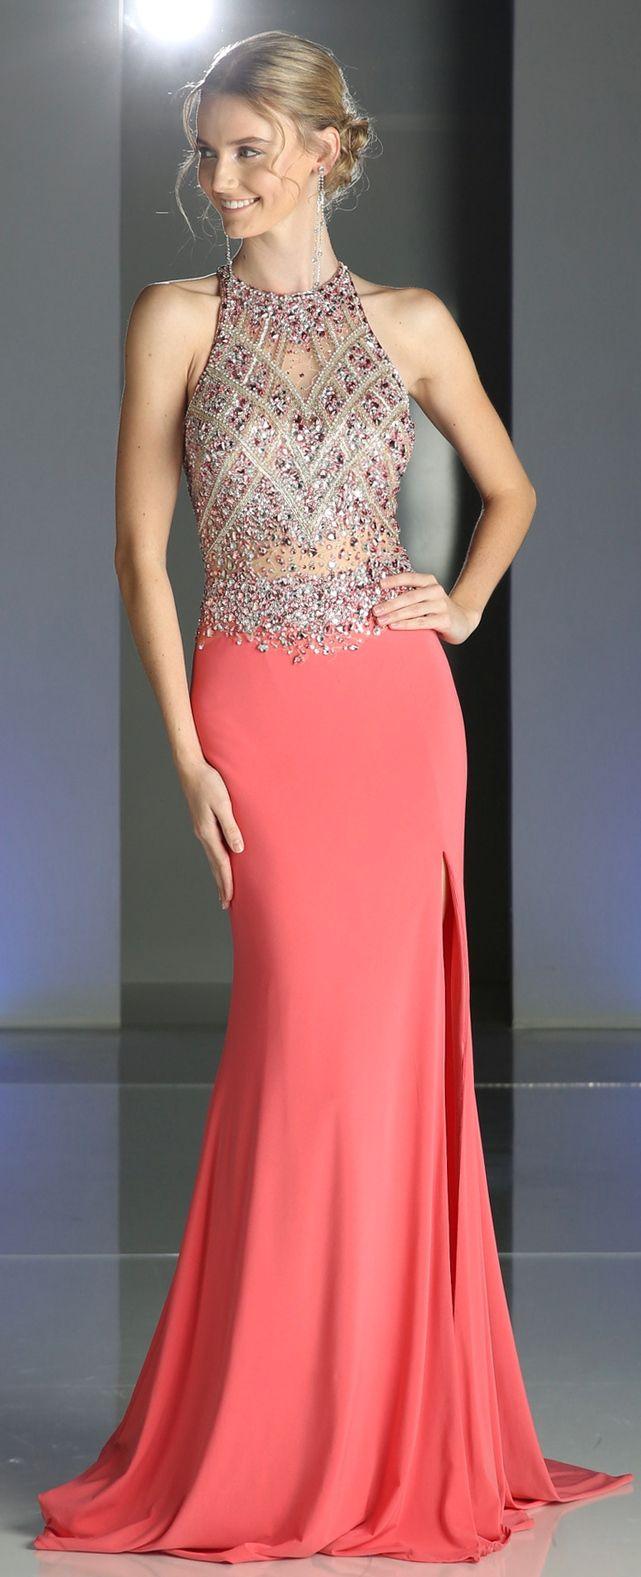 figure fitting prom dresses